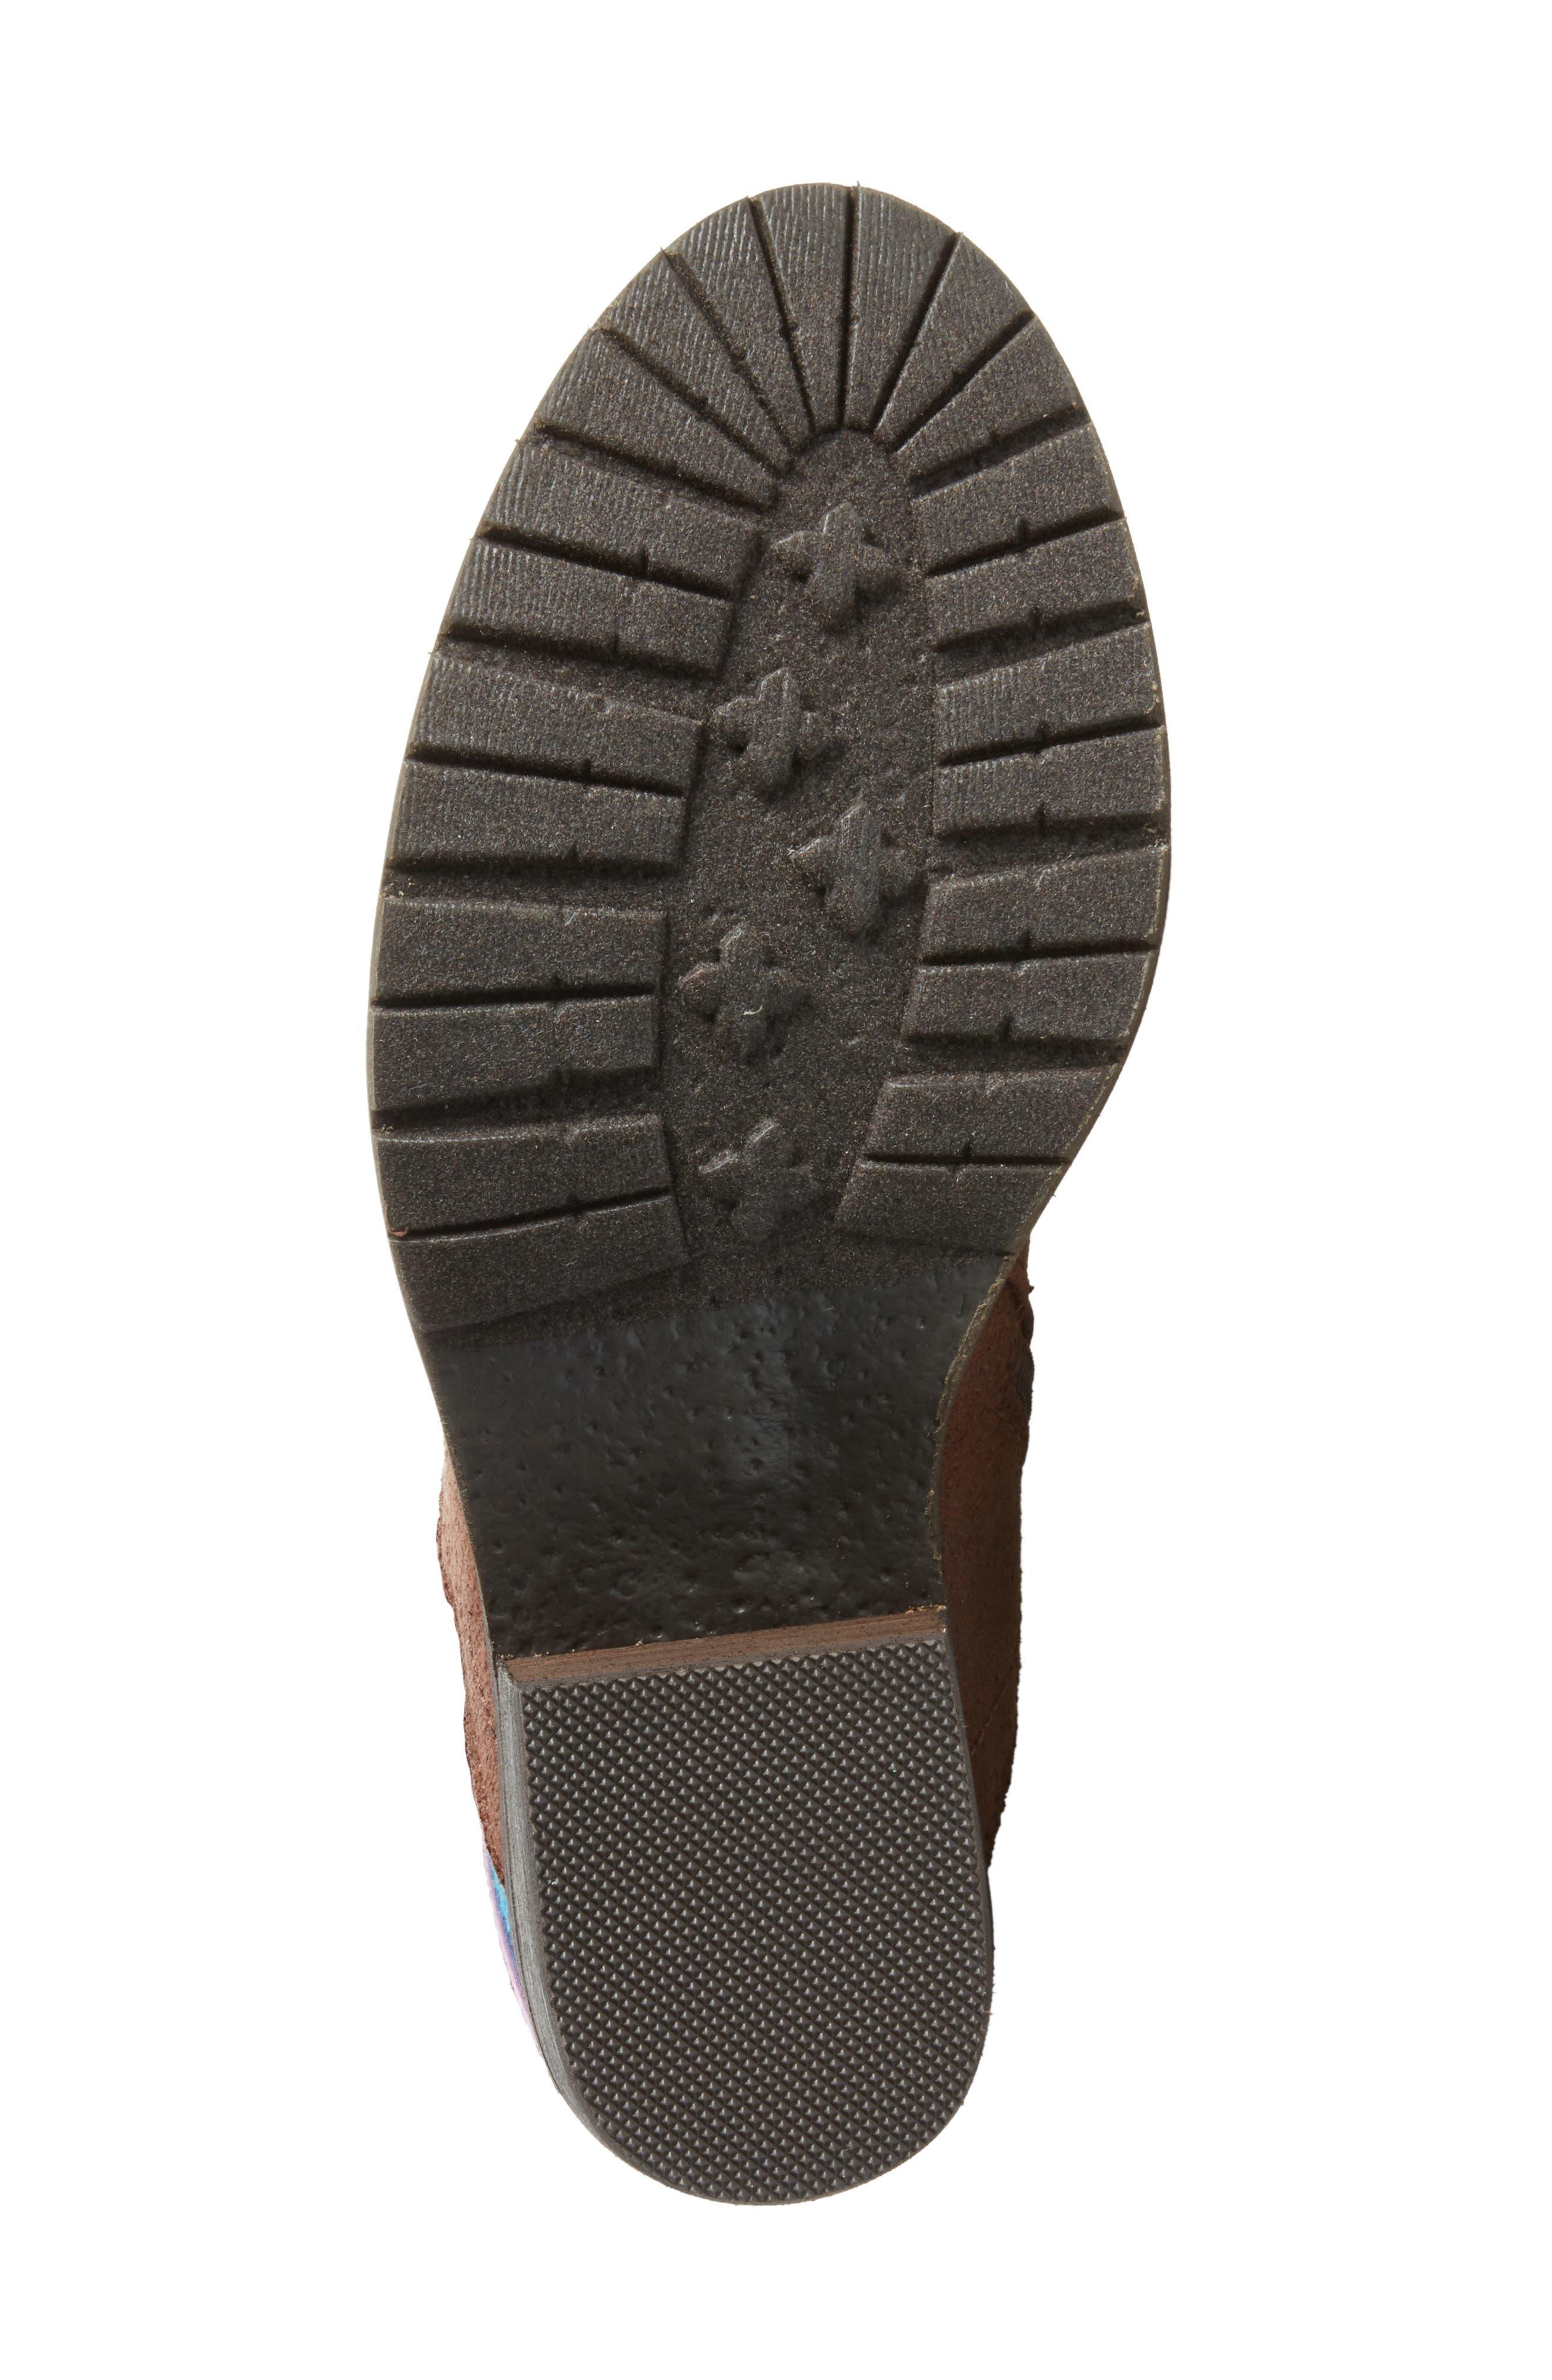 Marcel Corseted Knee High Boot,                             Alternate thumbnail 6, color,                             Serape